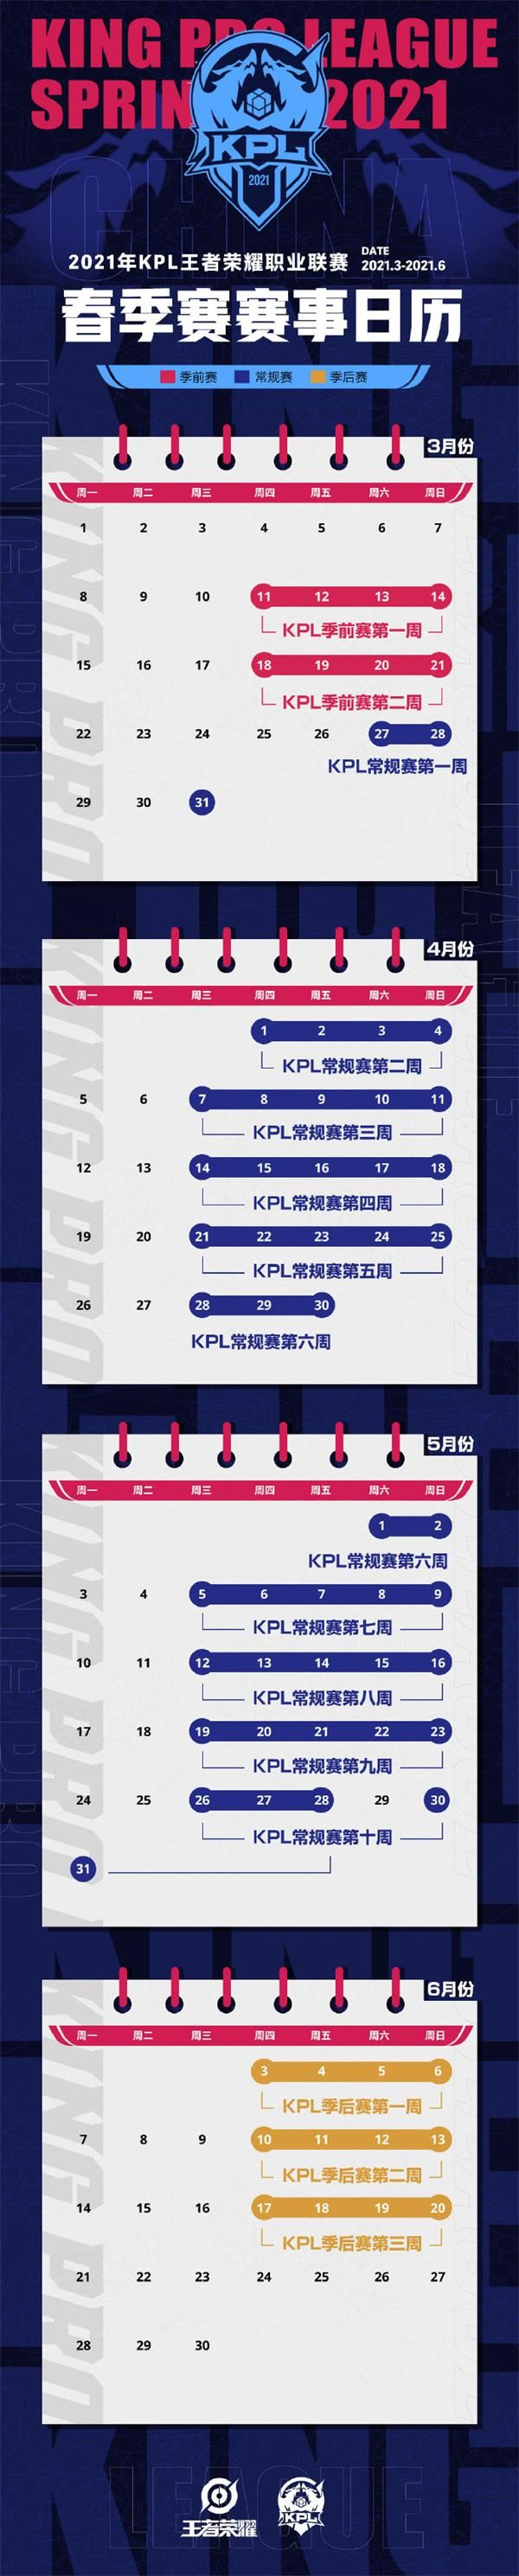 2021KPL春季赛赛程表一览